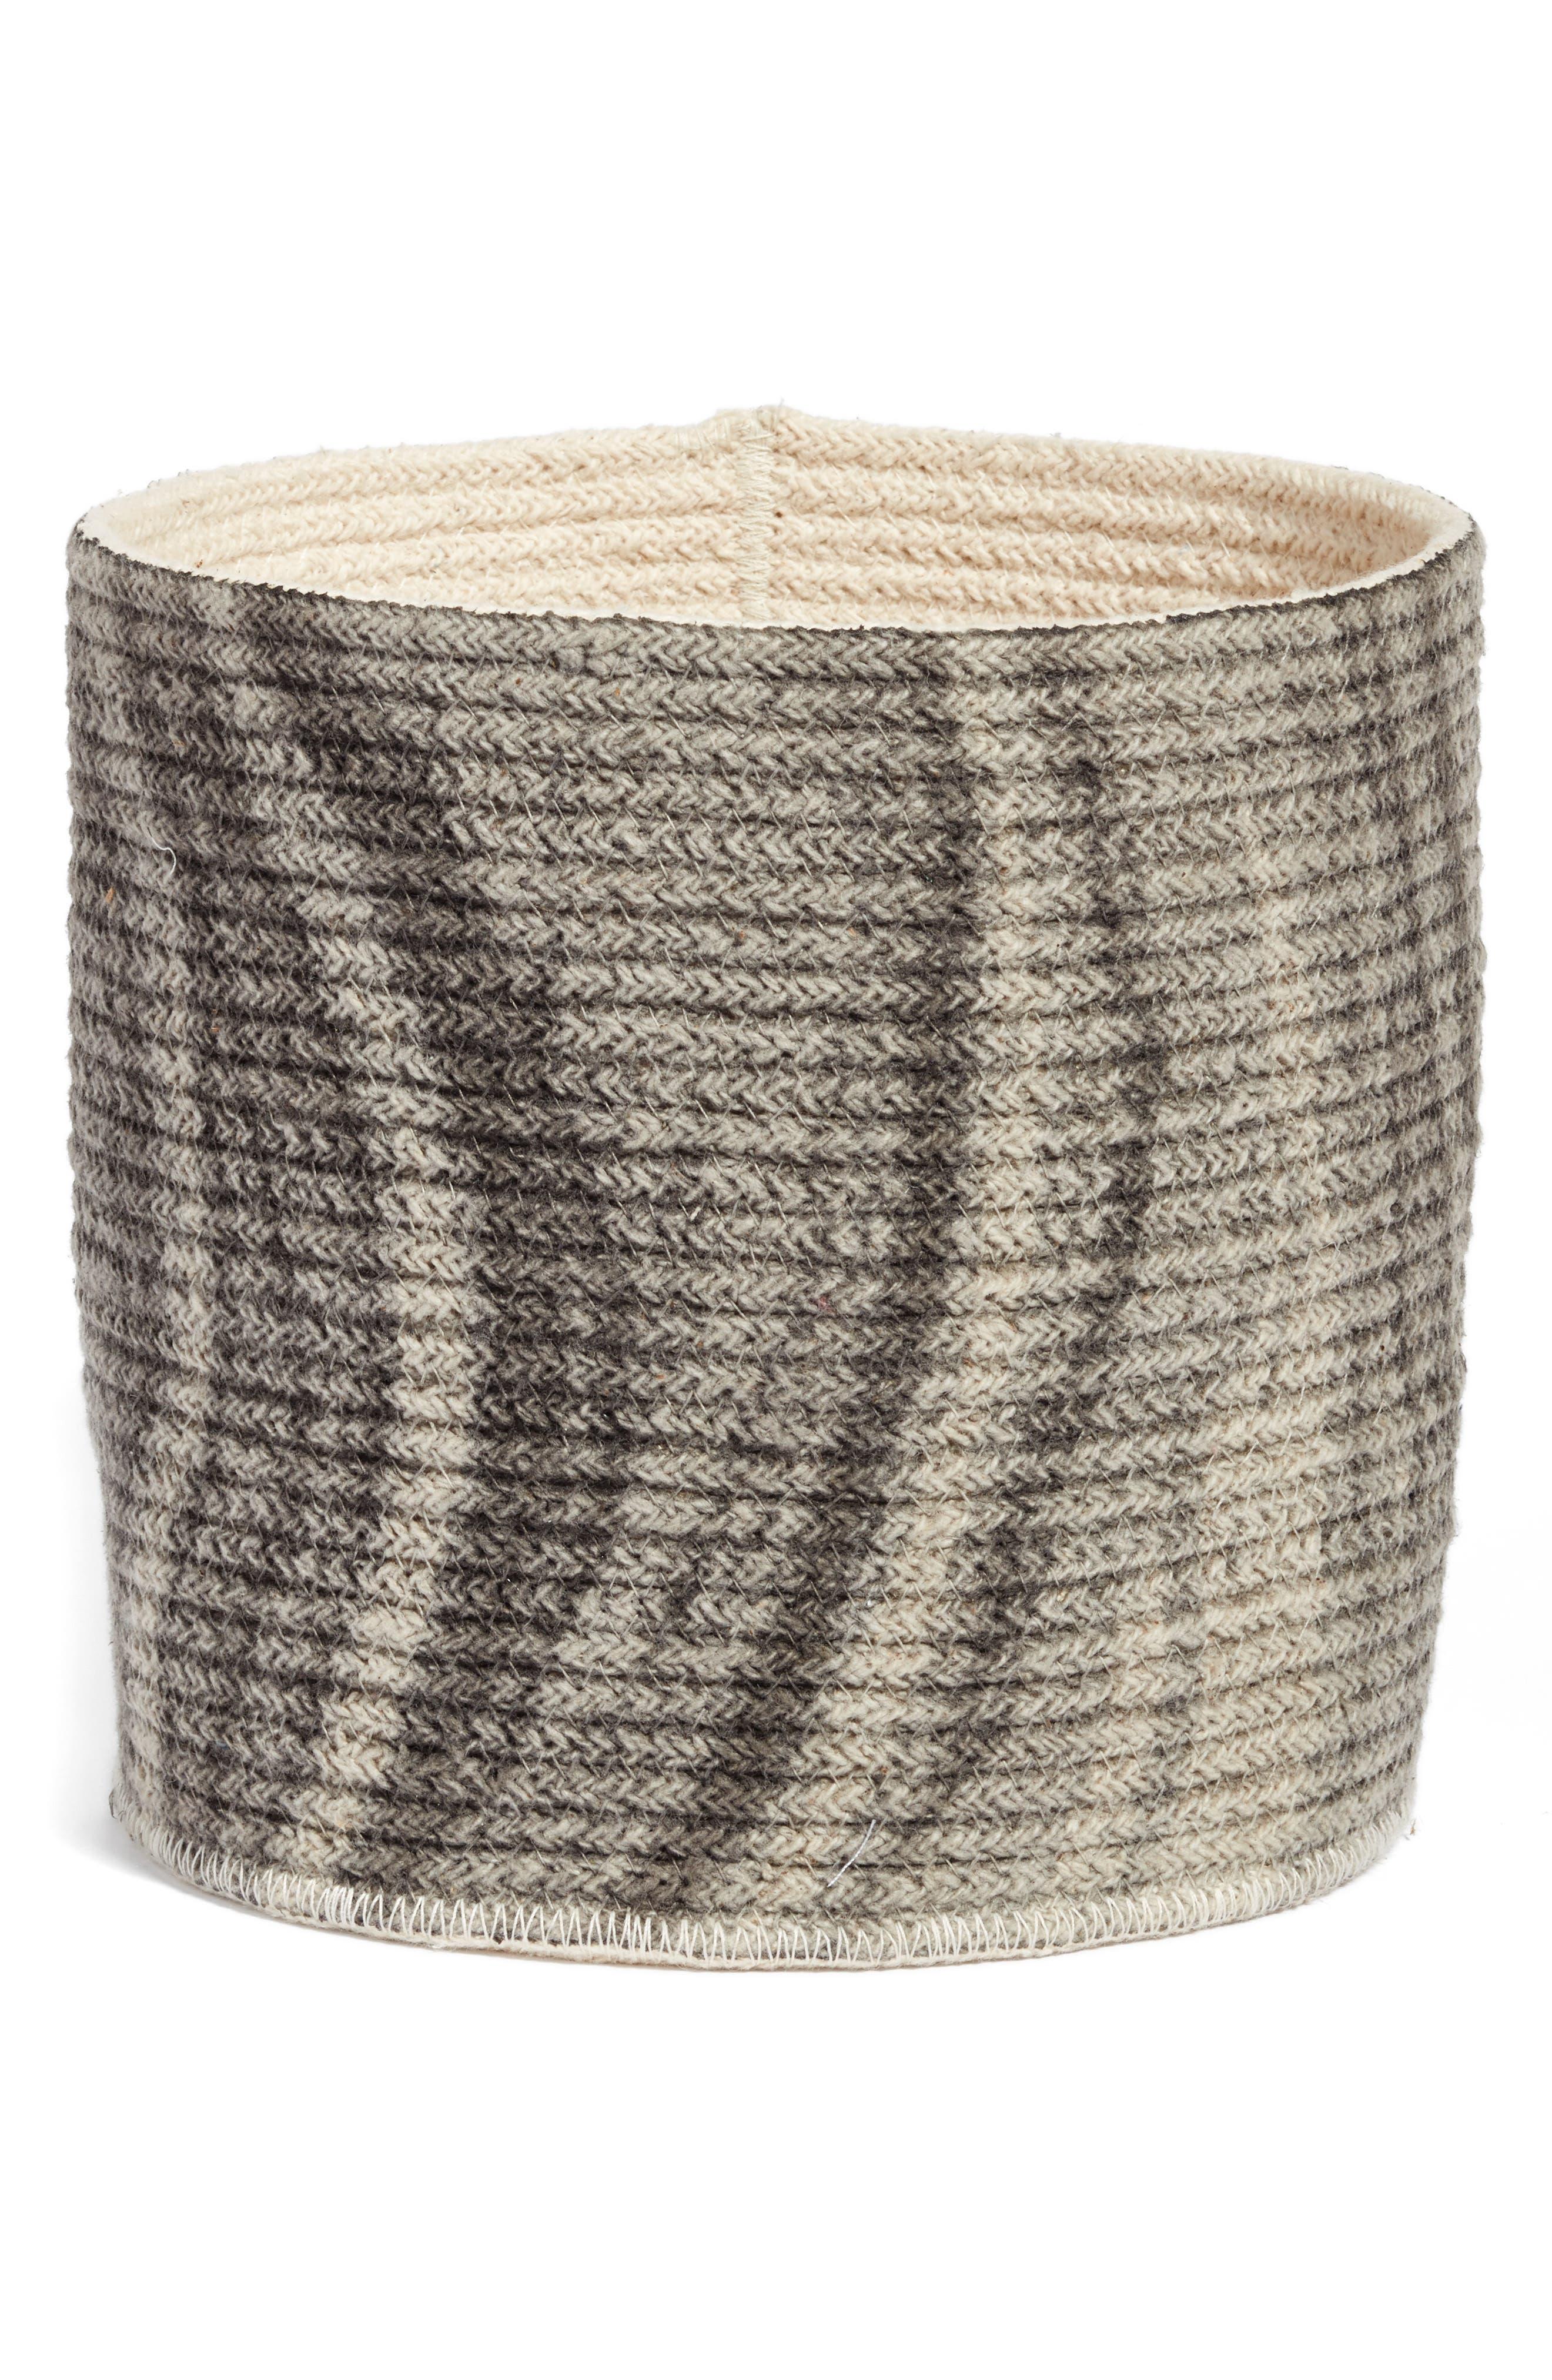 Nordstrom at Home Oceana Woven Basket